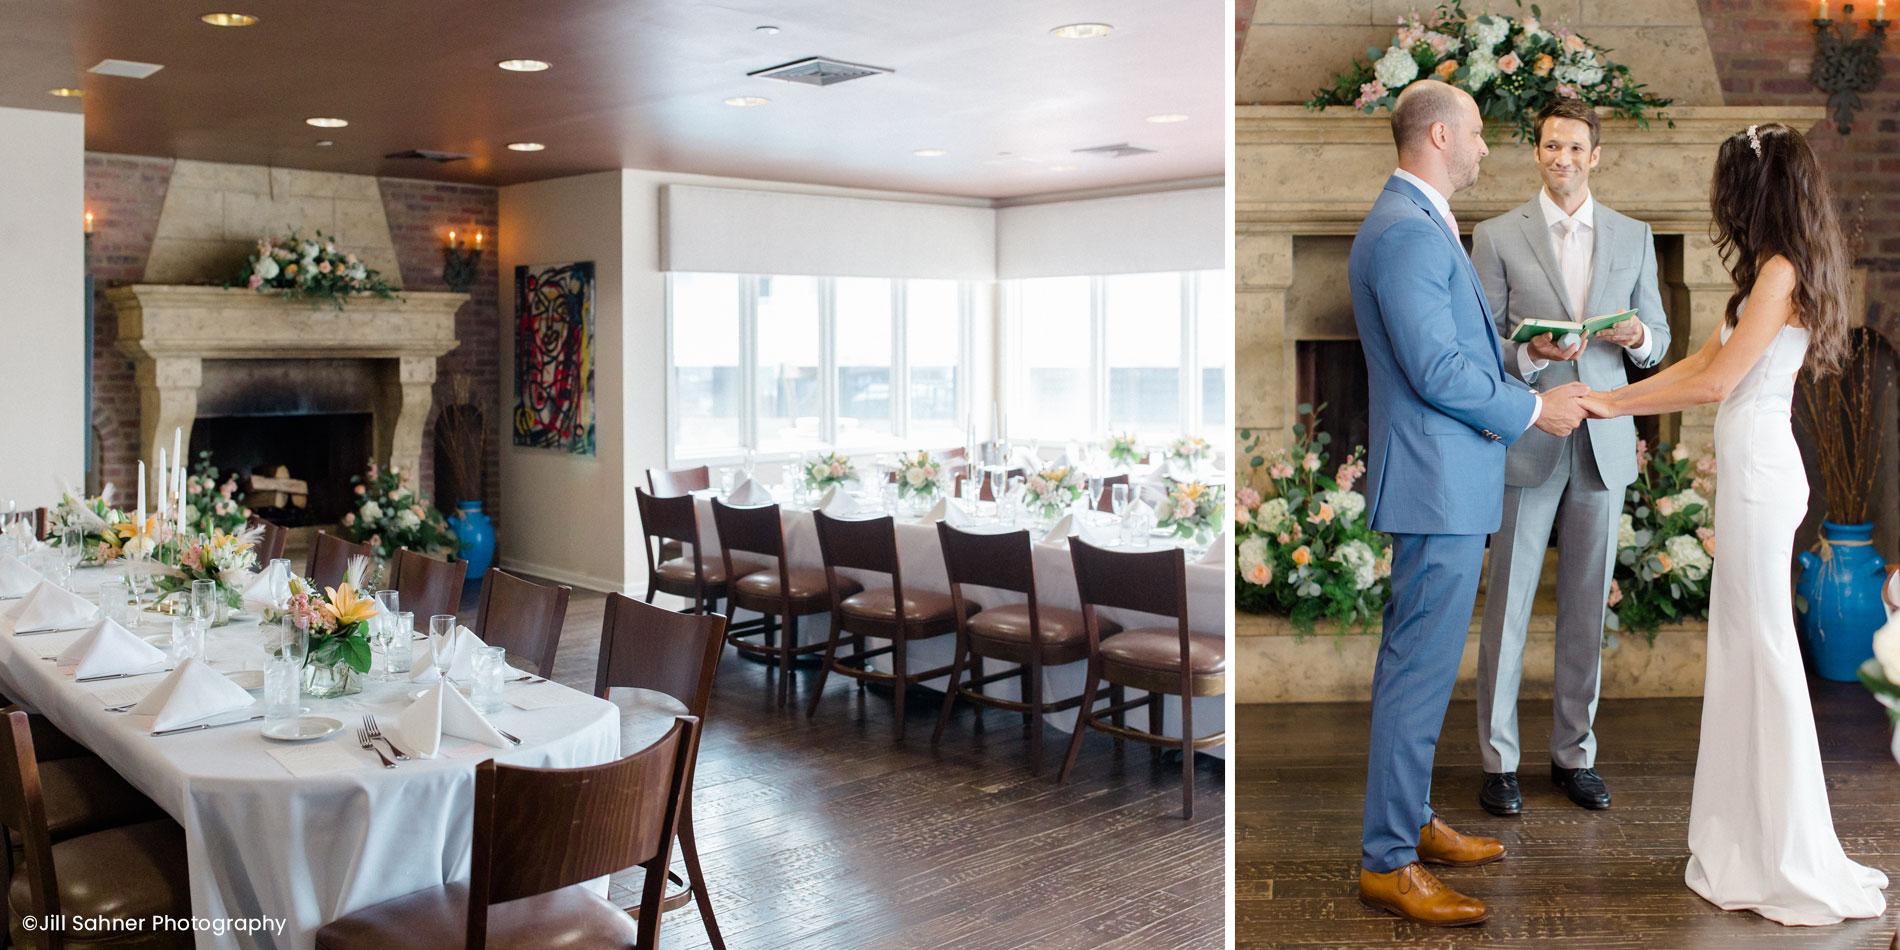 Weddings at Drifthouse by David Burke